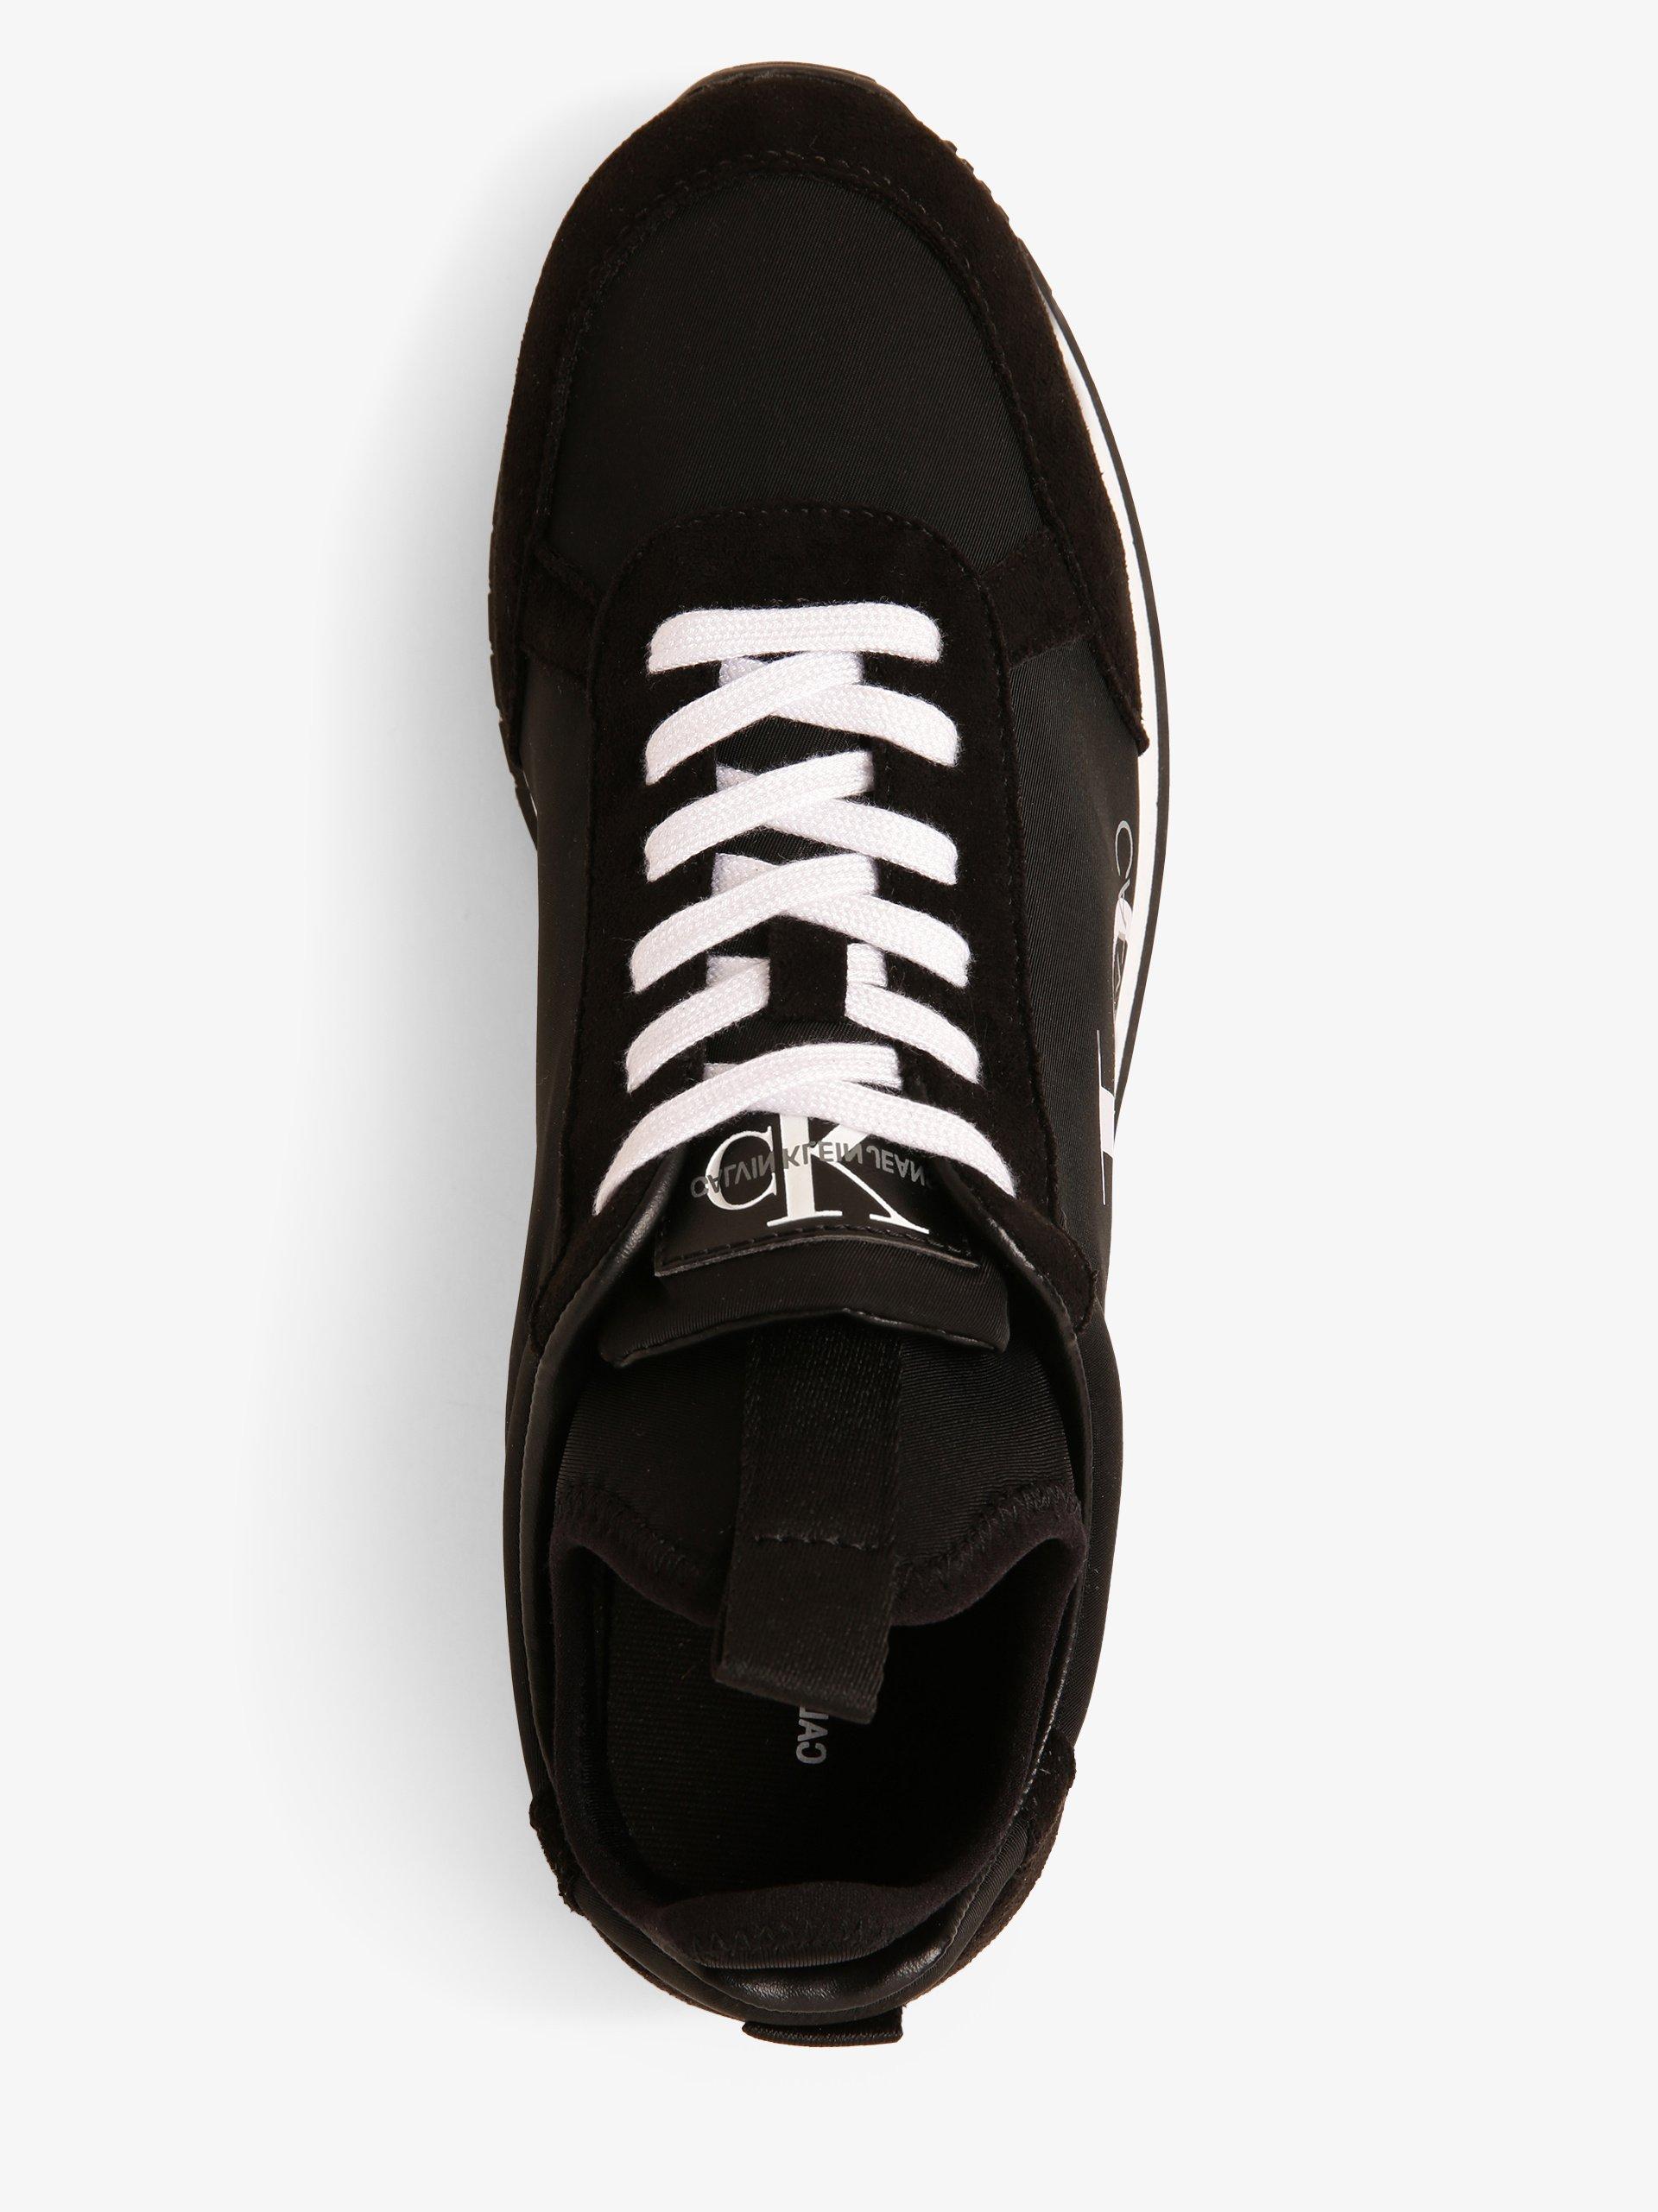 Calvin Klein Jeans Tenisówki damskie – Josslyn